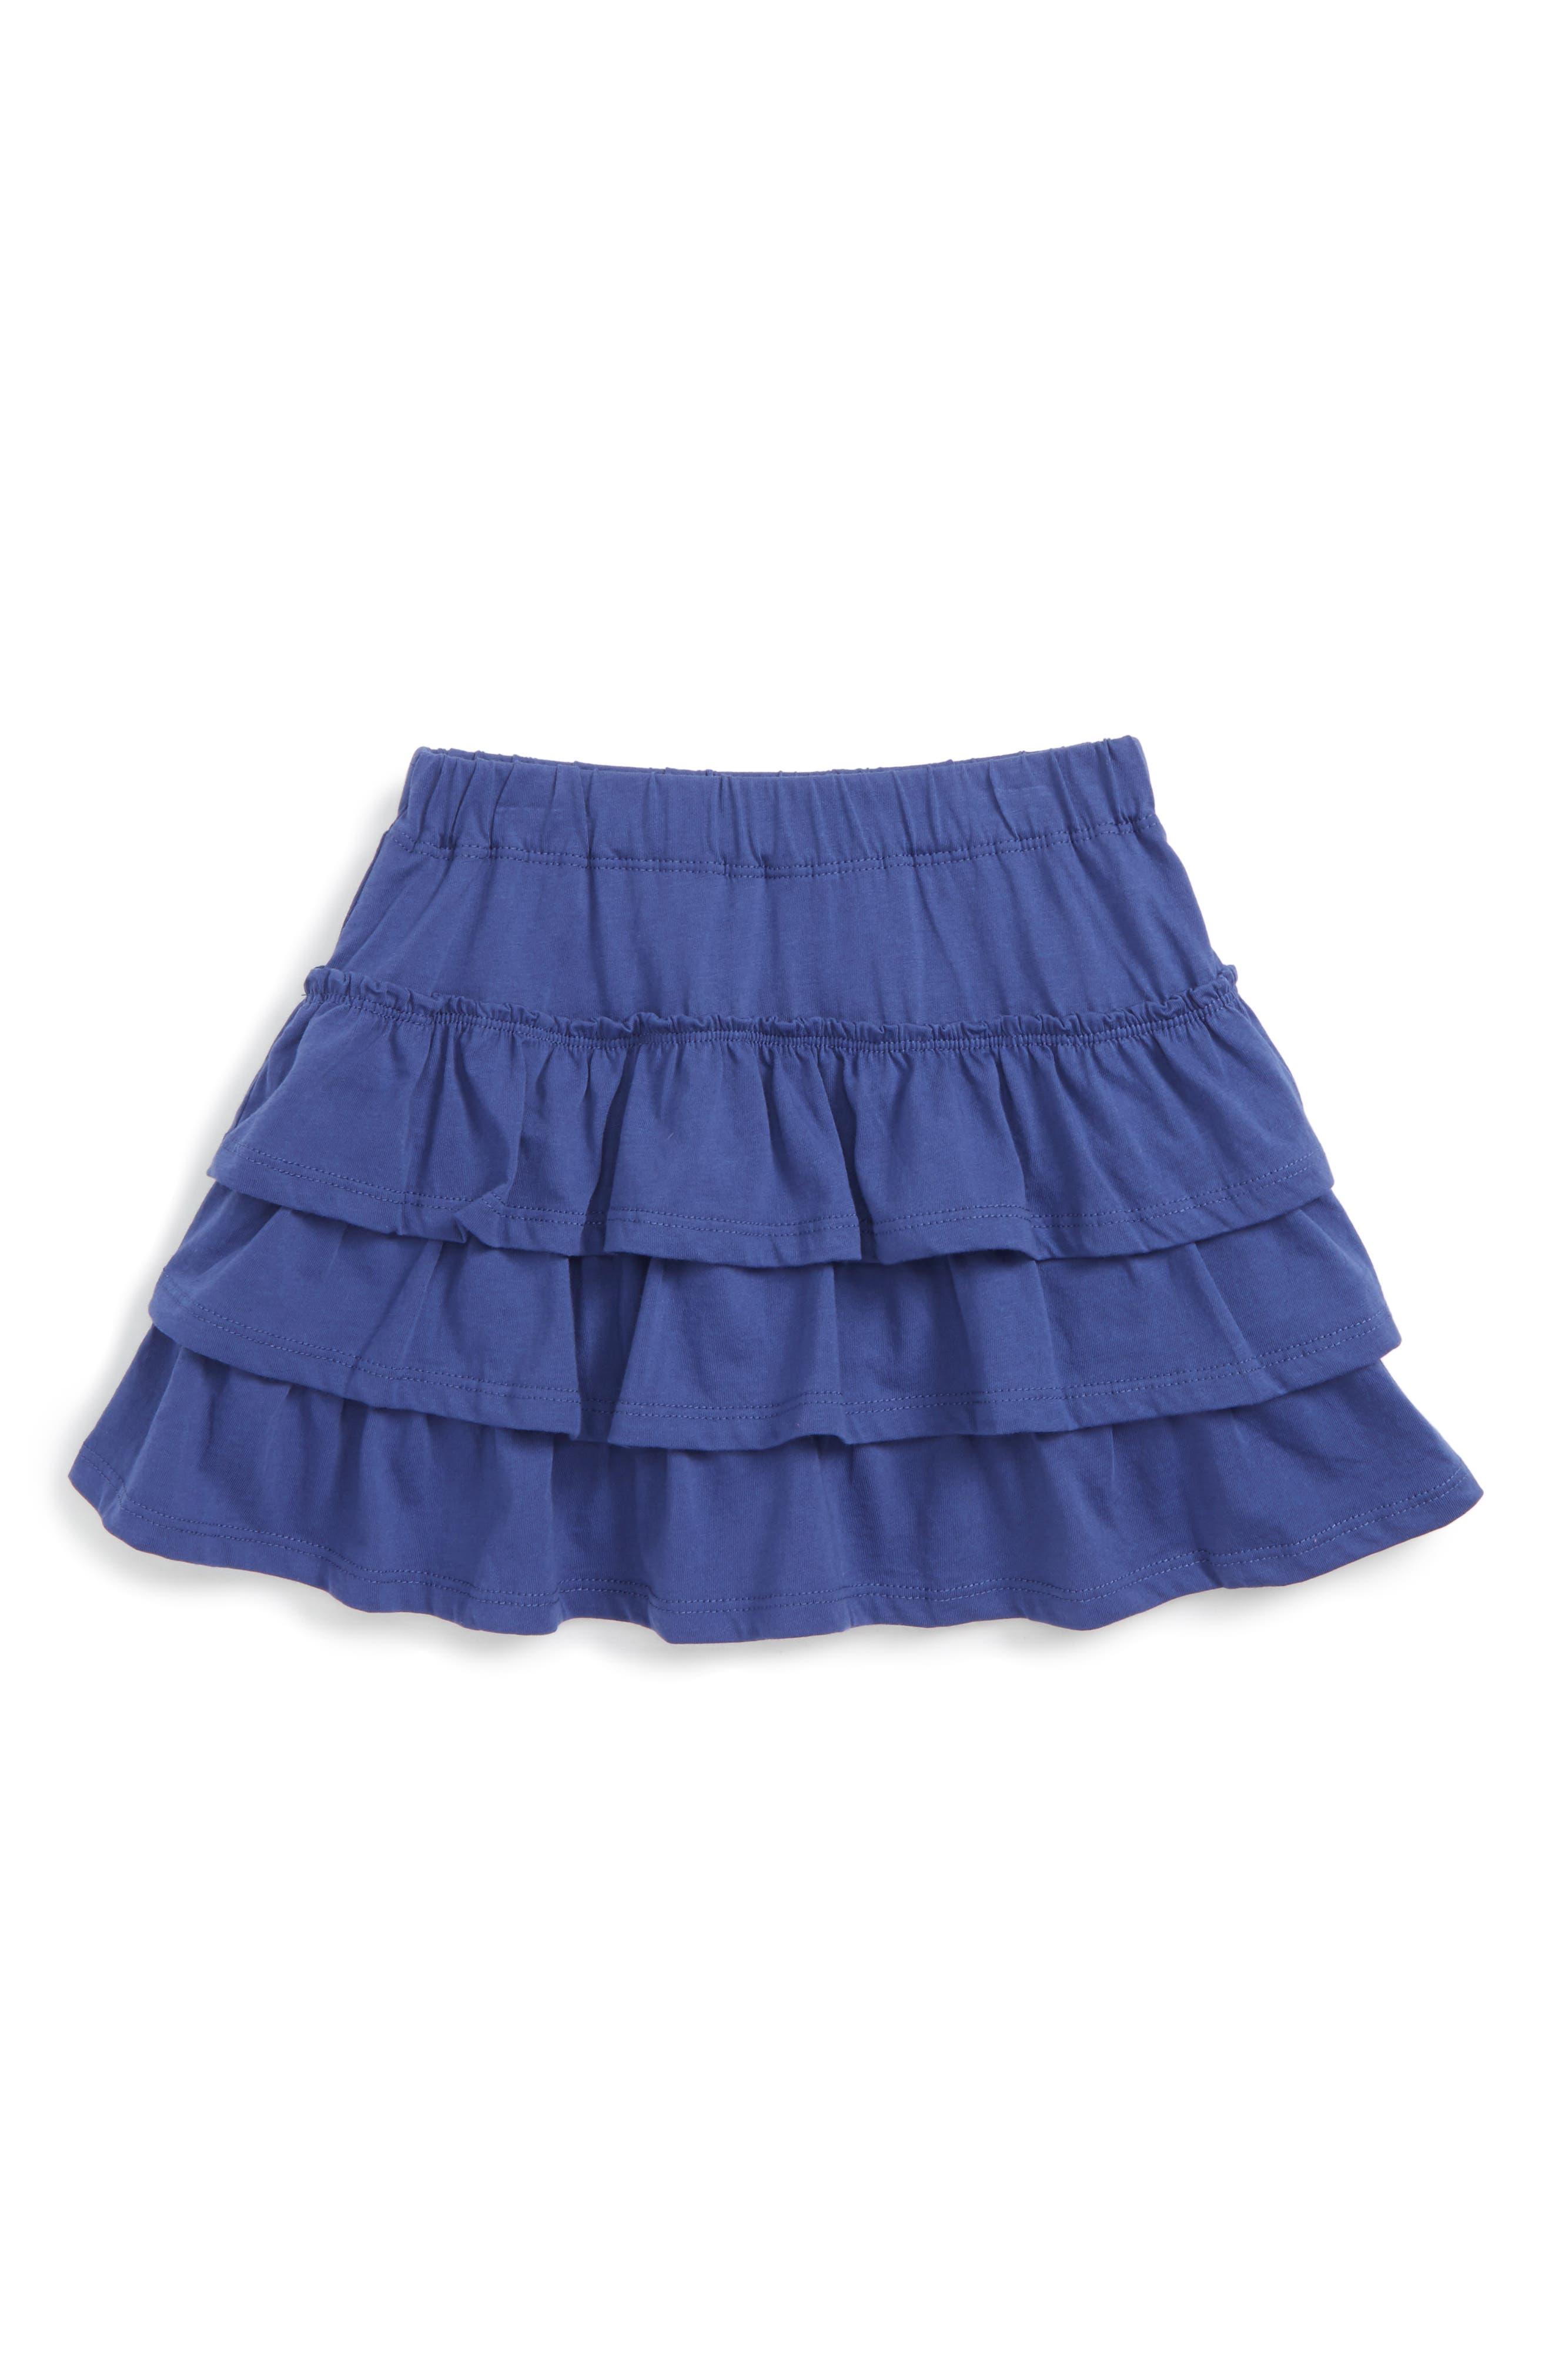 Mini Boden Ruffle Skort (Toddler Girls, Little Girls & Big Girls)